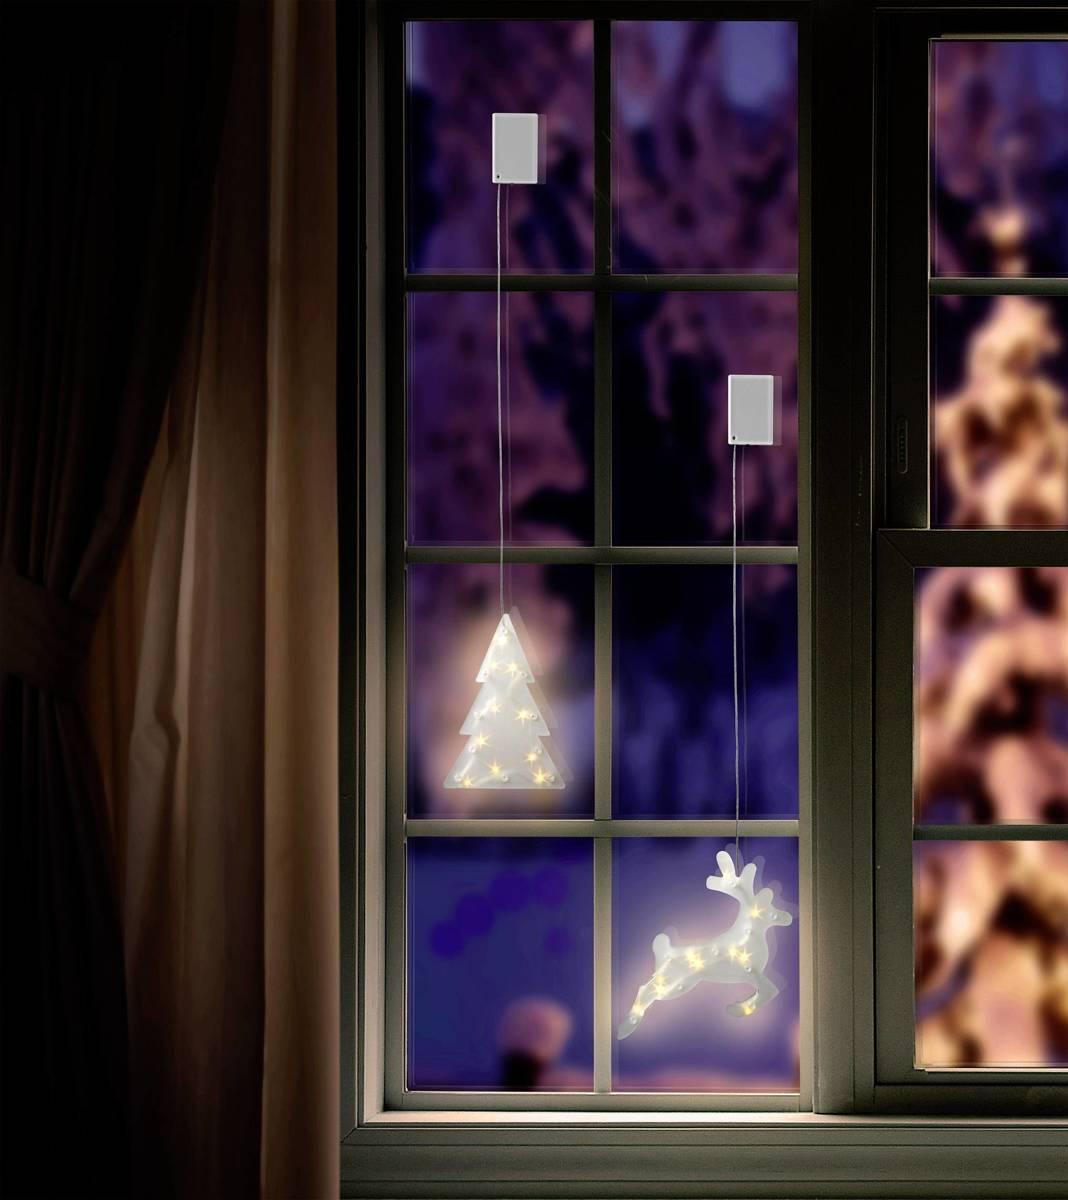 Raamdecoratie Kerstboom Warm-wit LED Transparant Polarlite LBA-50-020 kopen